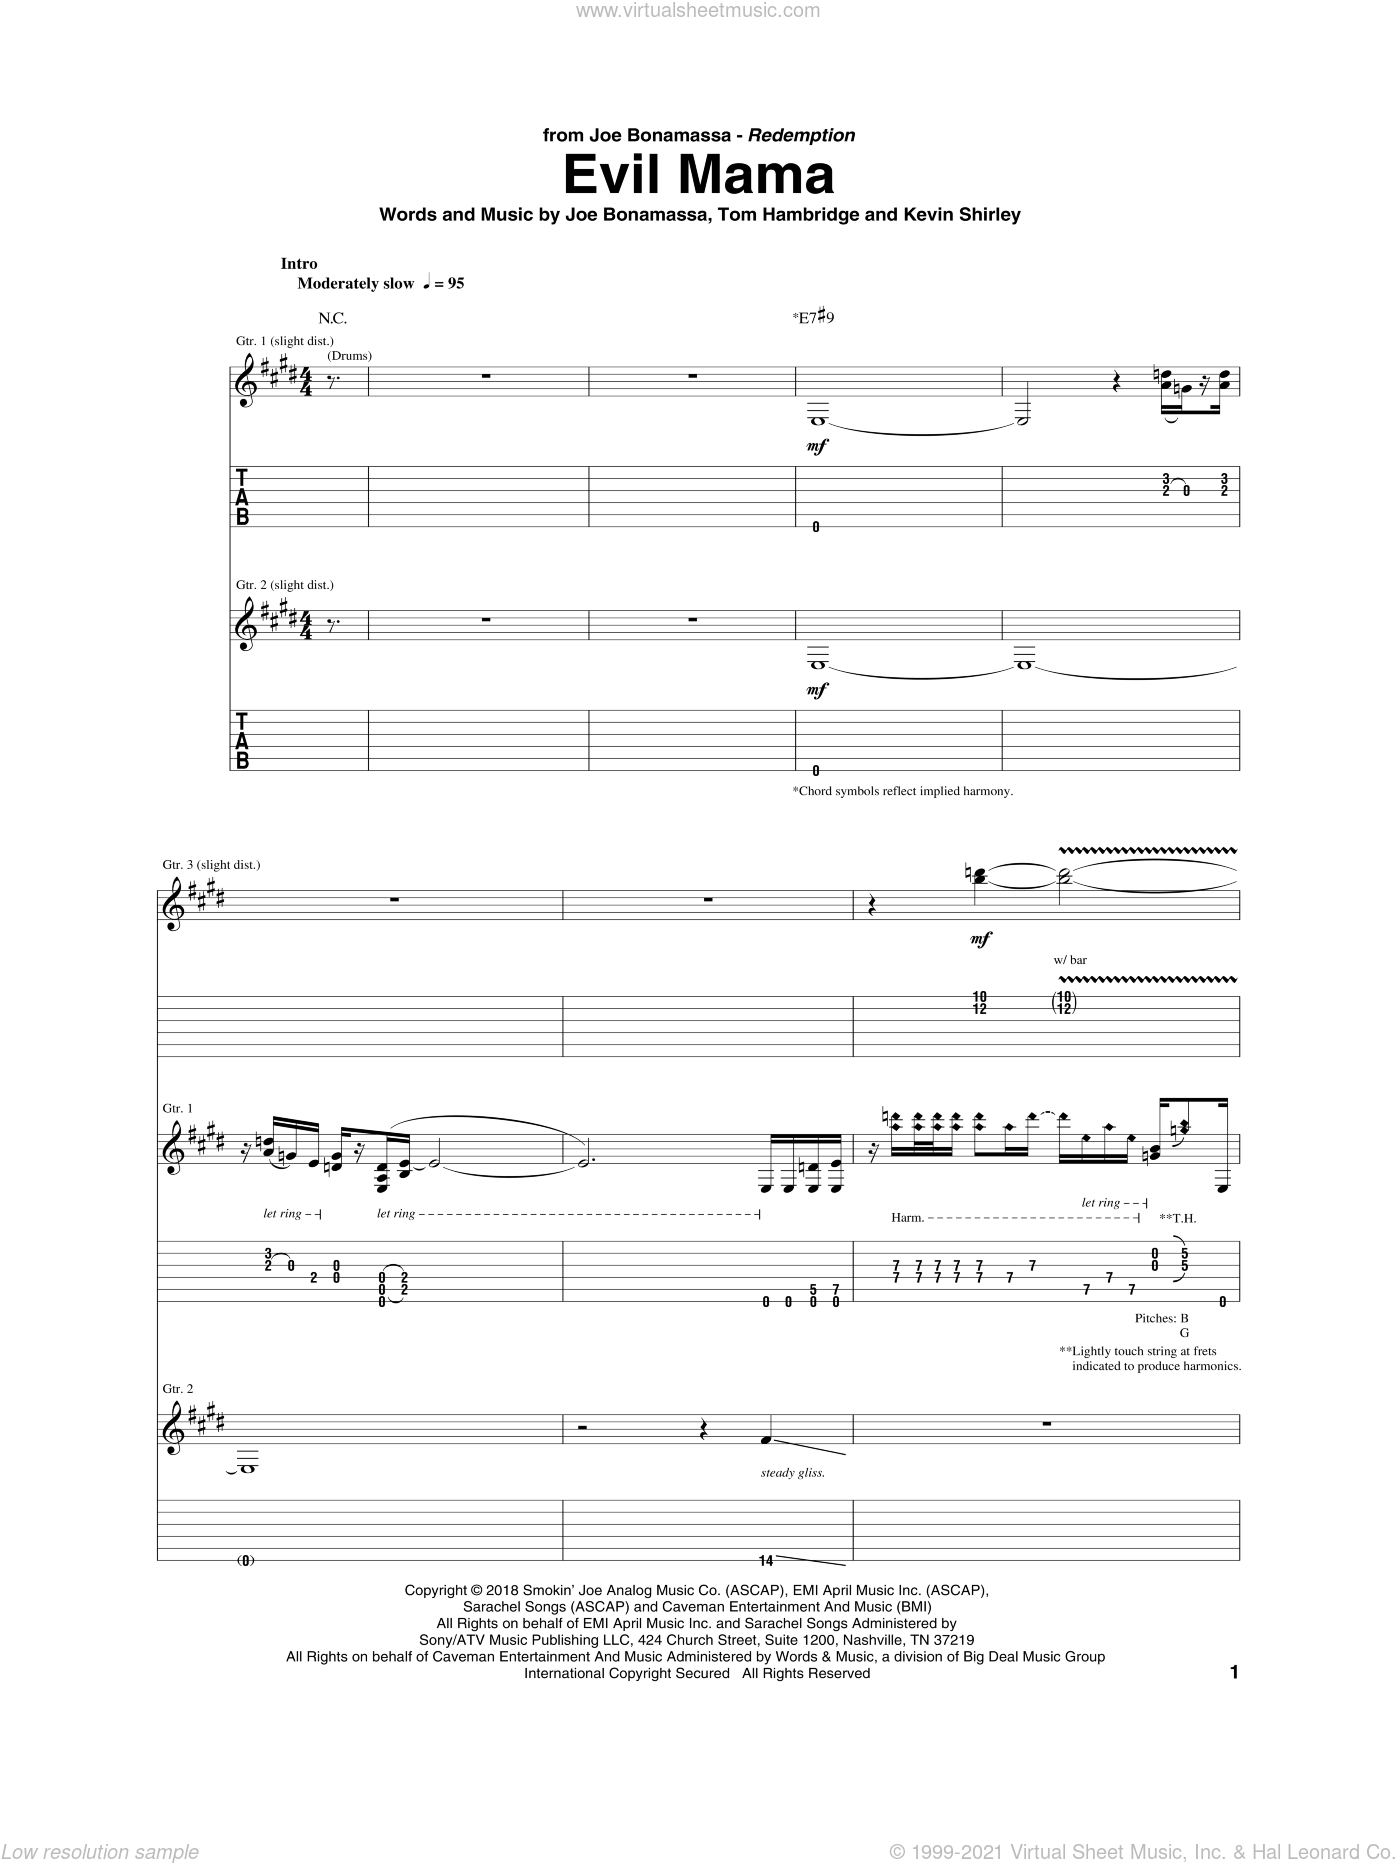 Evil Mama sheet music for guitar (tablature) by Joe Bonamassa, Kevin Shirley and Tom Hambridge, intermediate skill level